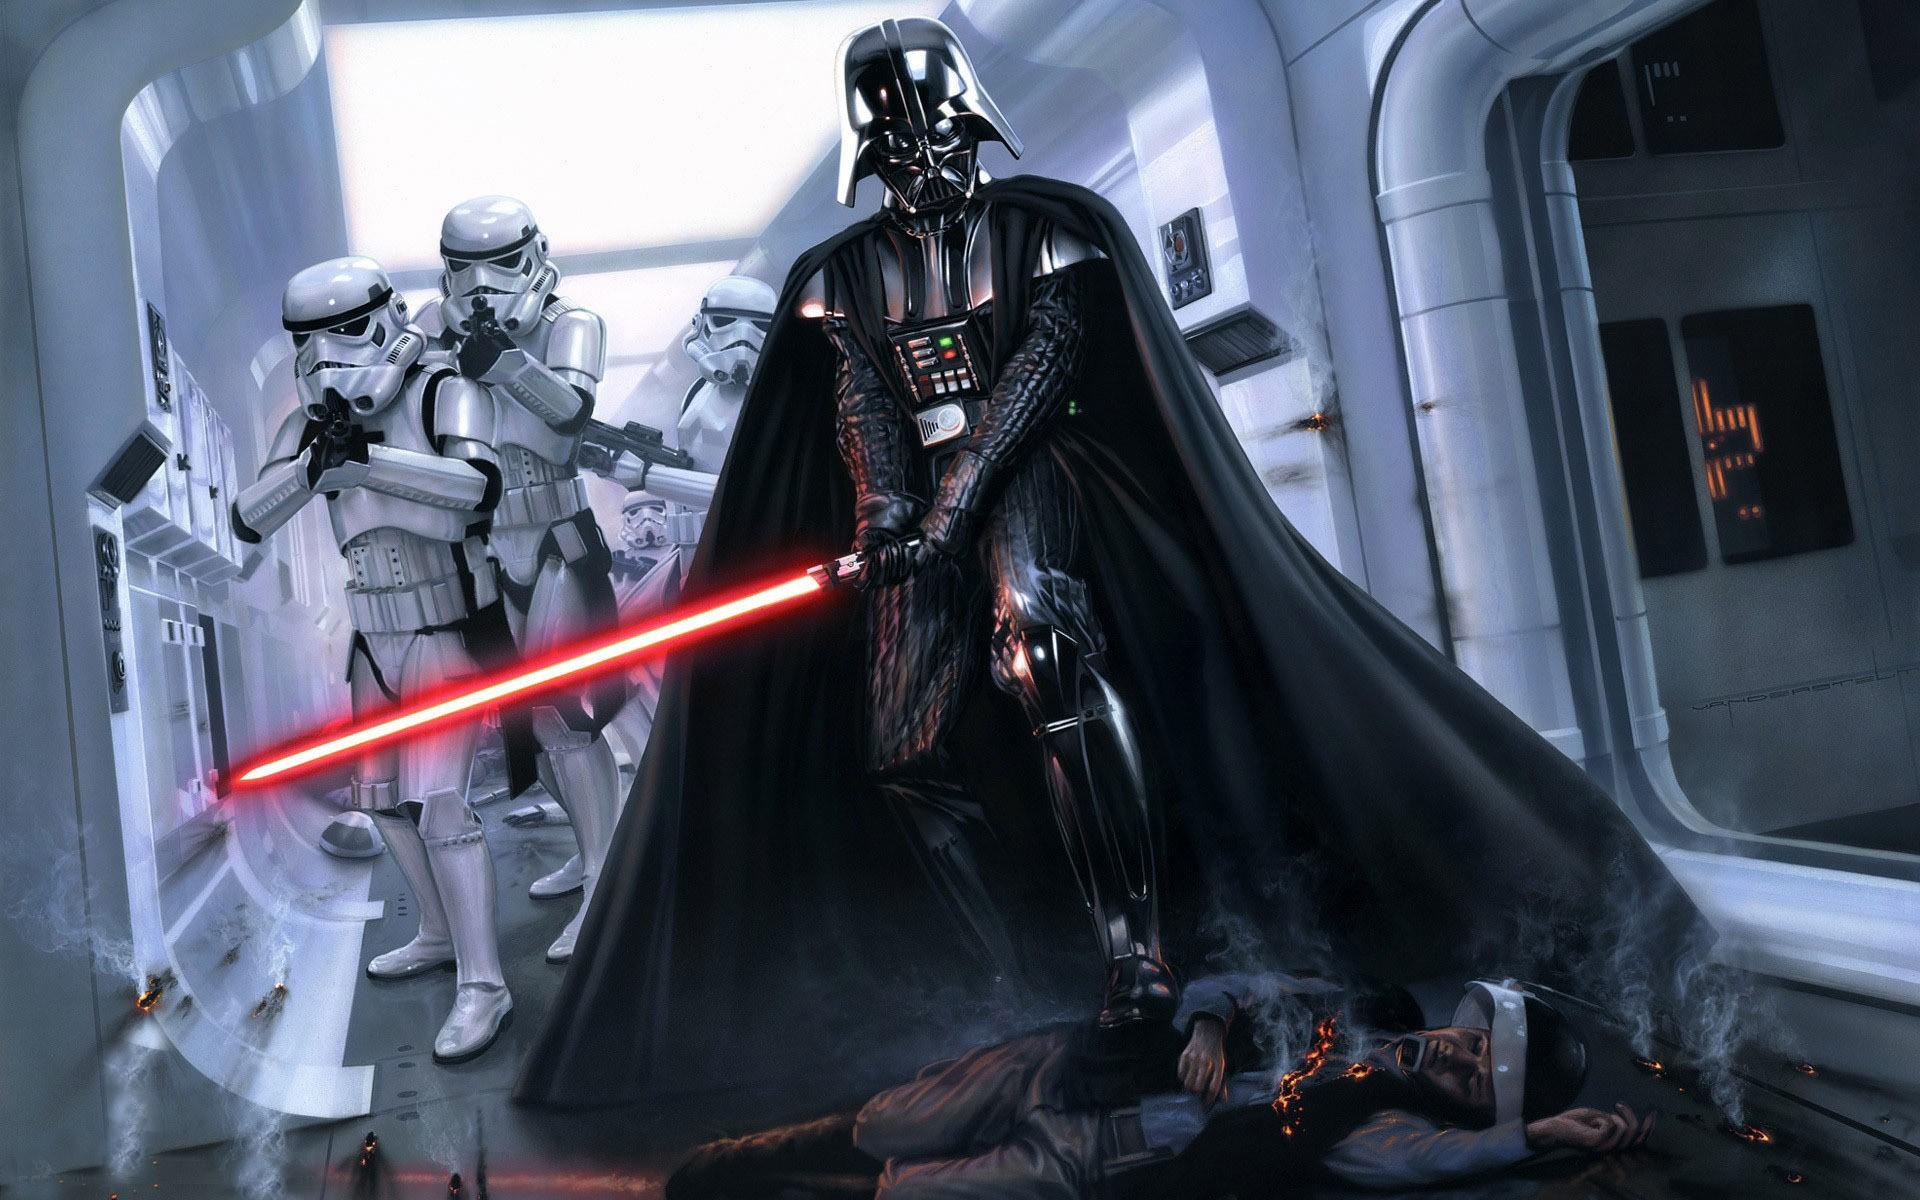 General 1920x1200 Darth Vader Star Wars lightsaber stormtrooper